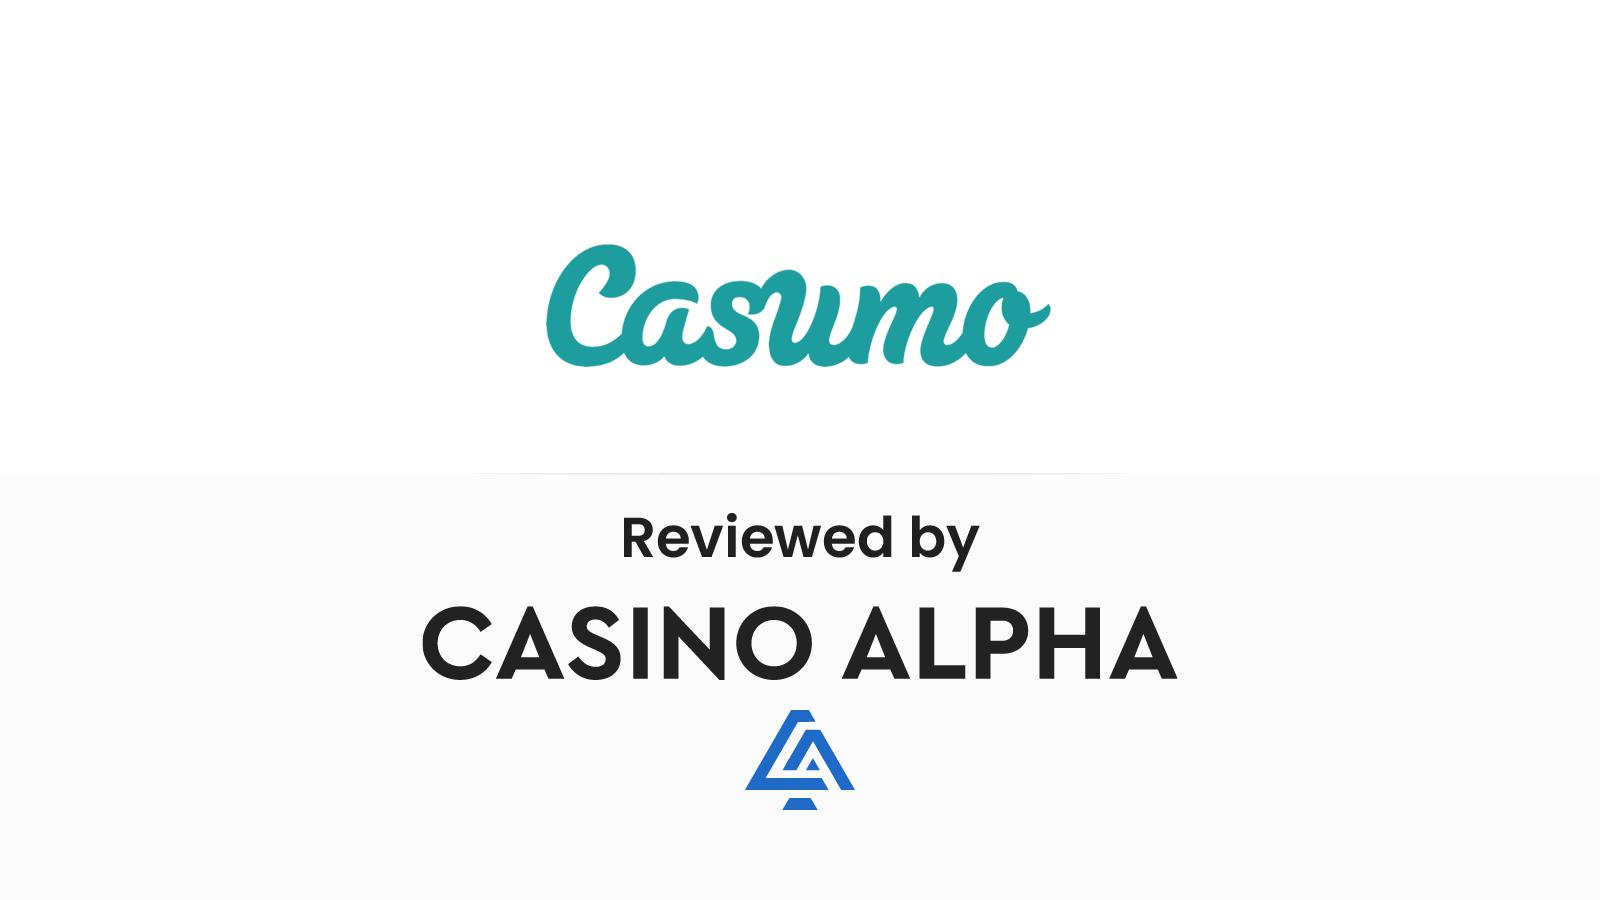 Casumo Review & Coupon codes